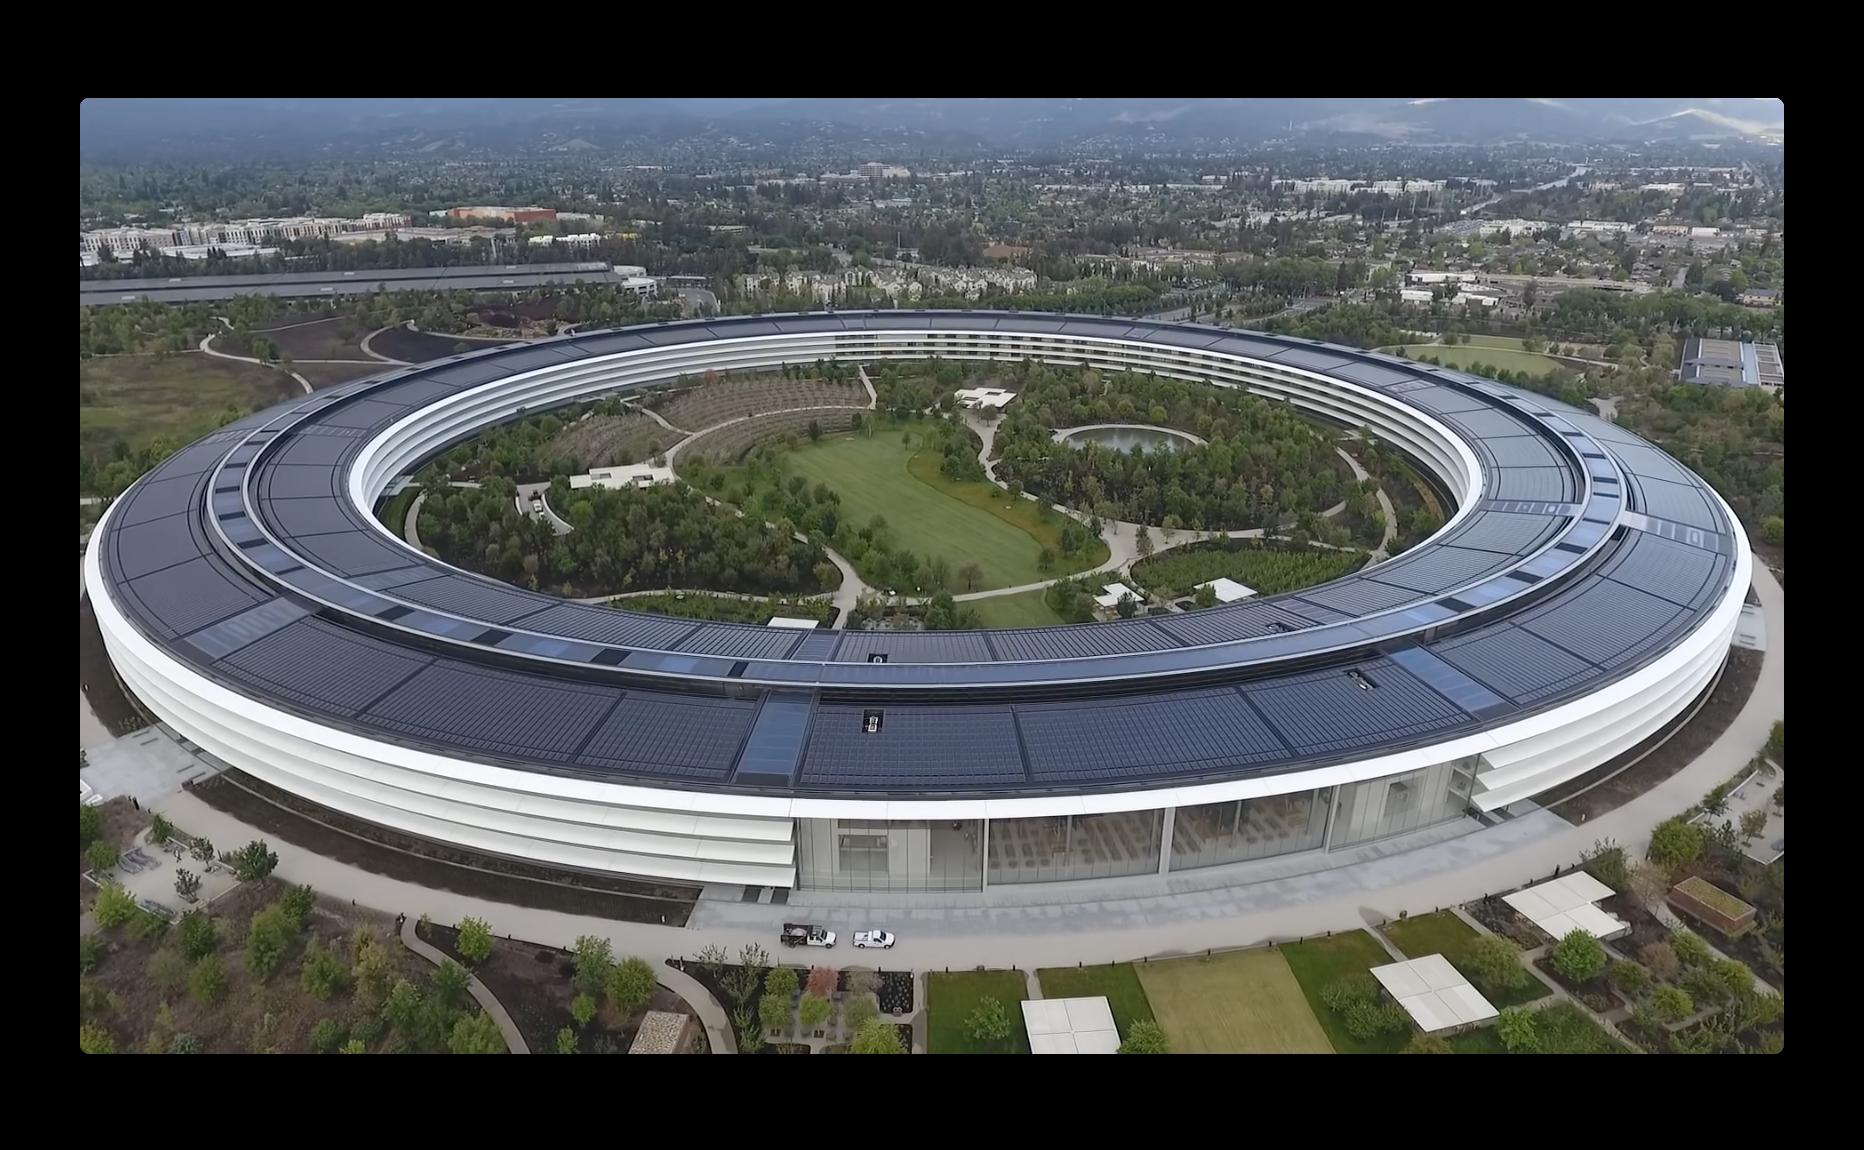 Appleの2万人規模の新キャンパス候補地にノースカロライナ州中央部と北部バージニア州